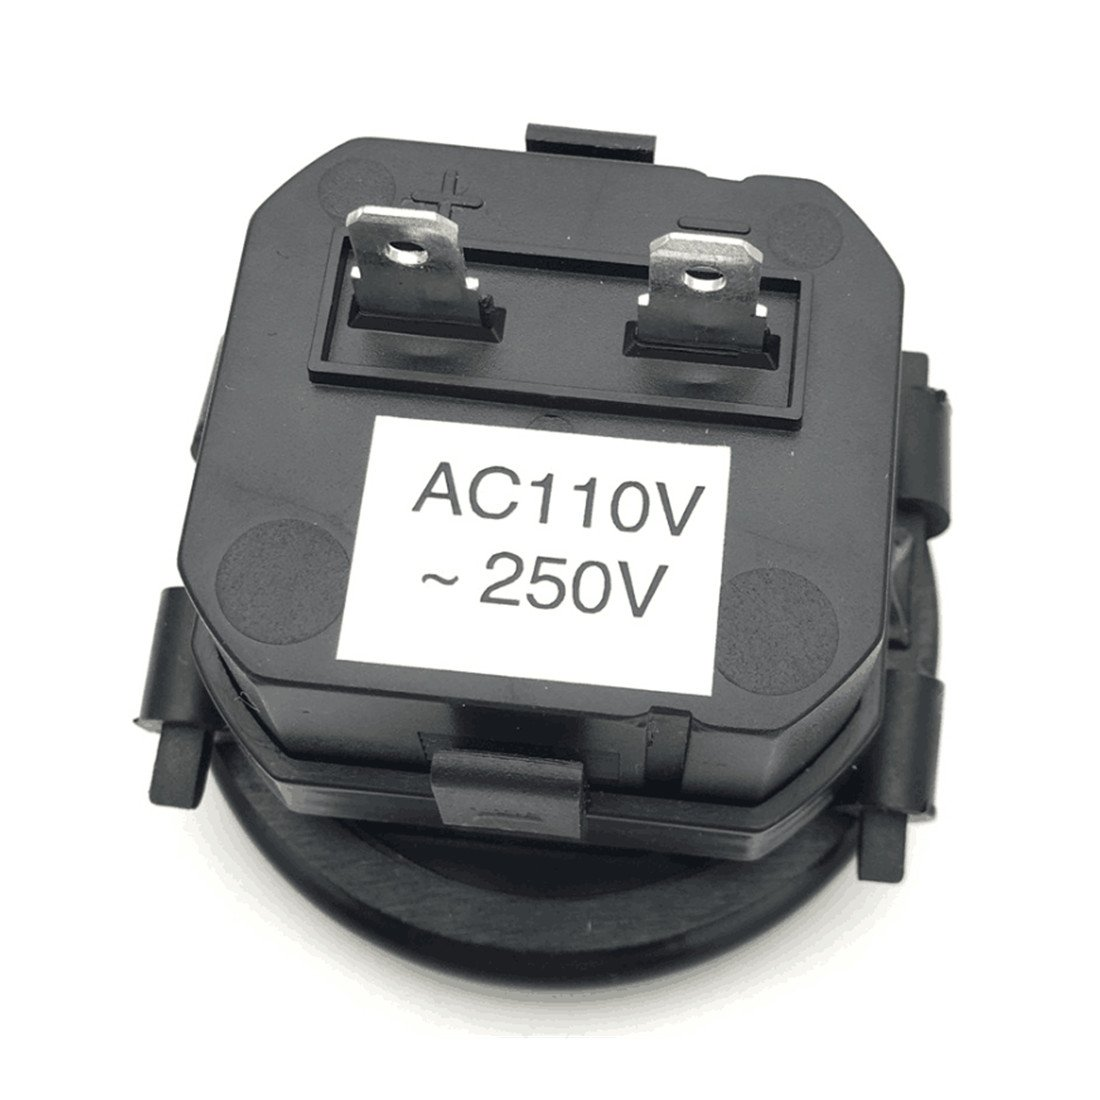 AC110-250V AIMILAR Mechanical Hour Meter Gauge Professional Engine Hourmeter AC110-250V for Boat Auto ATV UTV Snowmobile Lawn Tractors Generators 4350402307